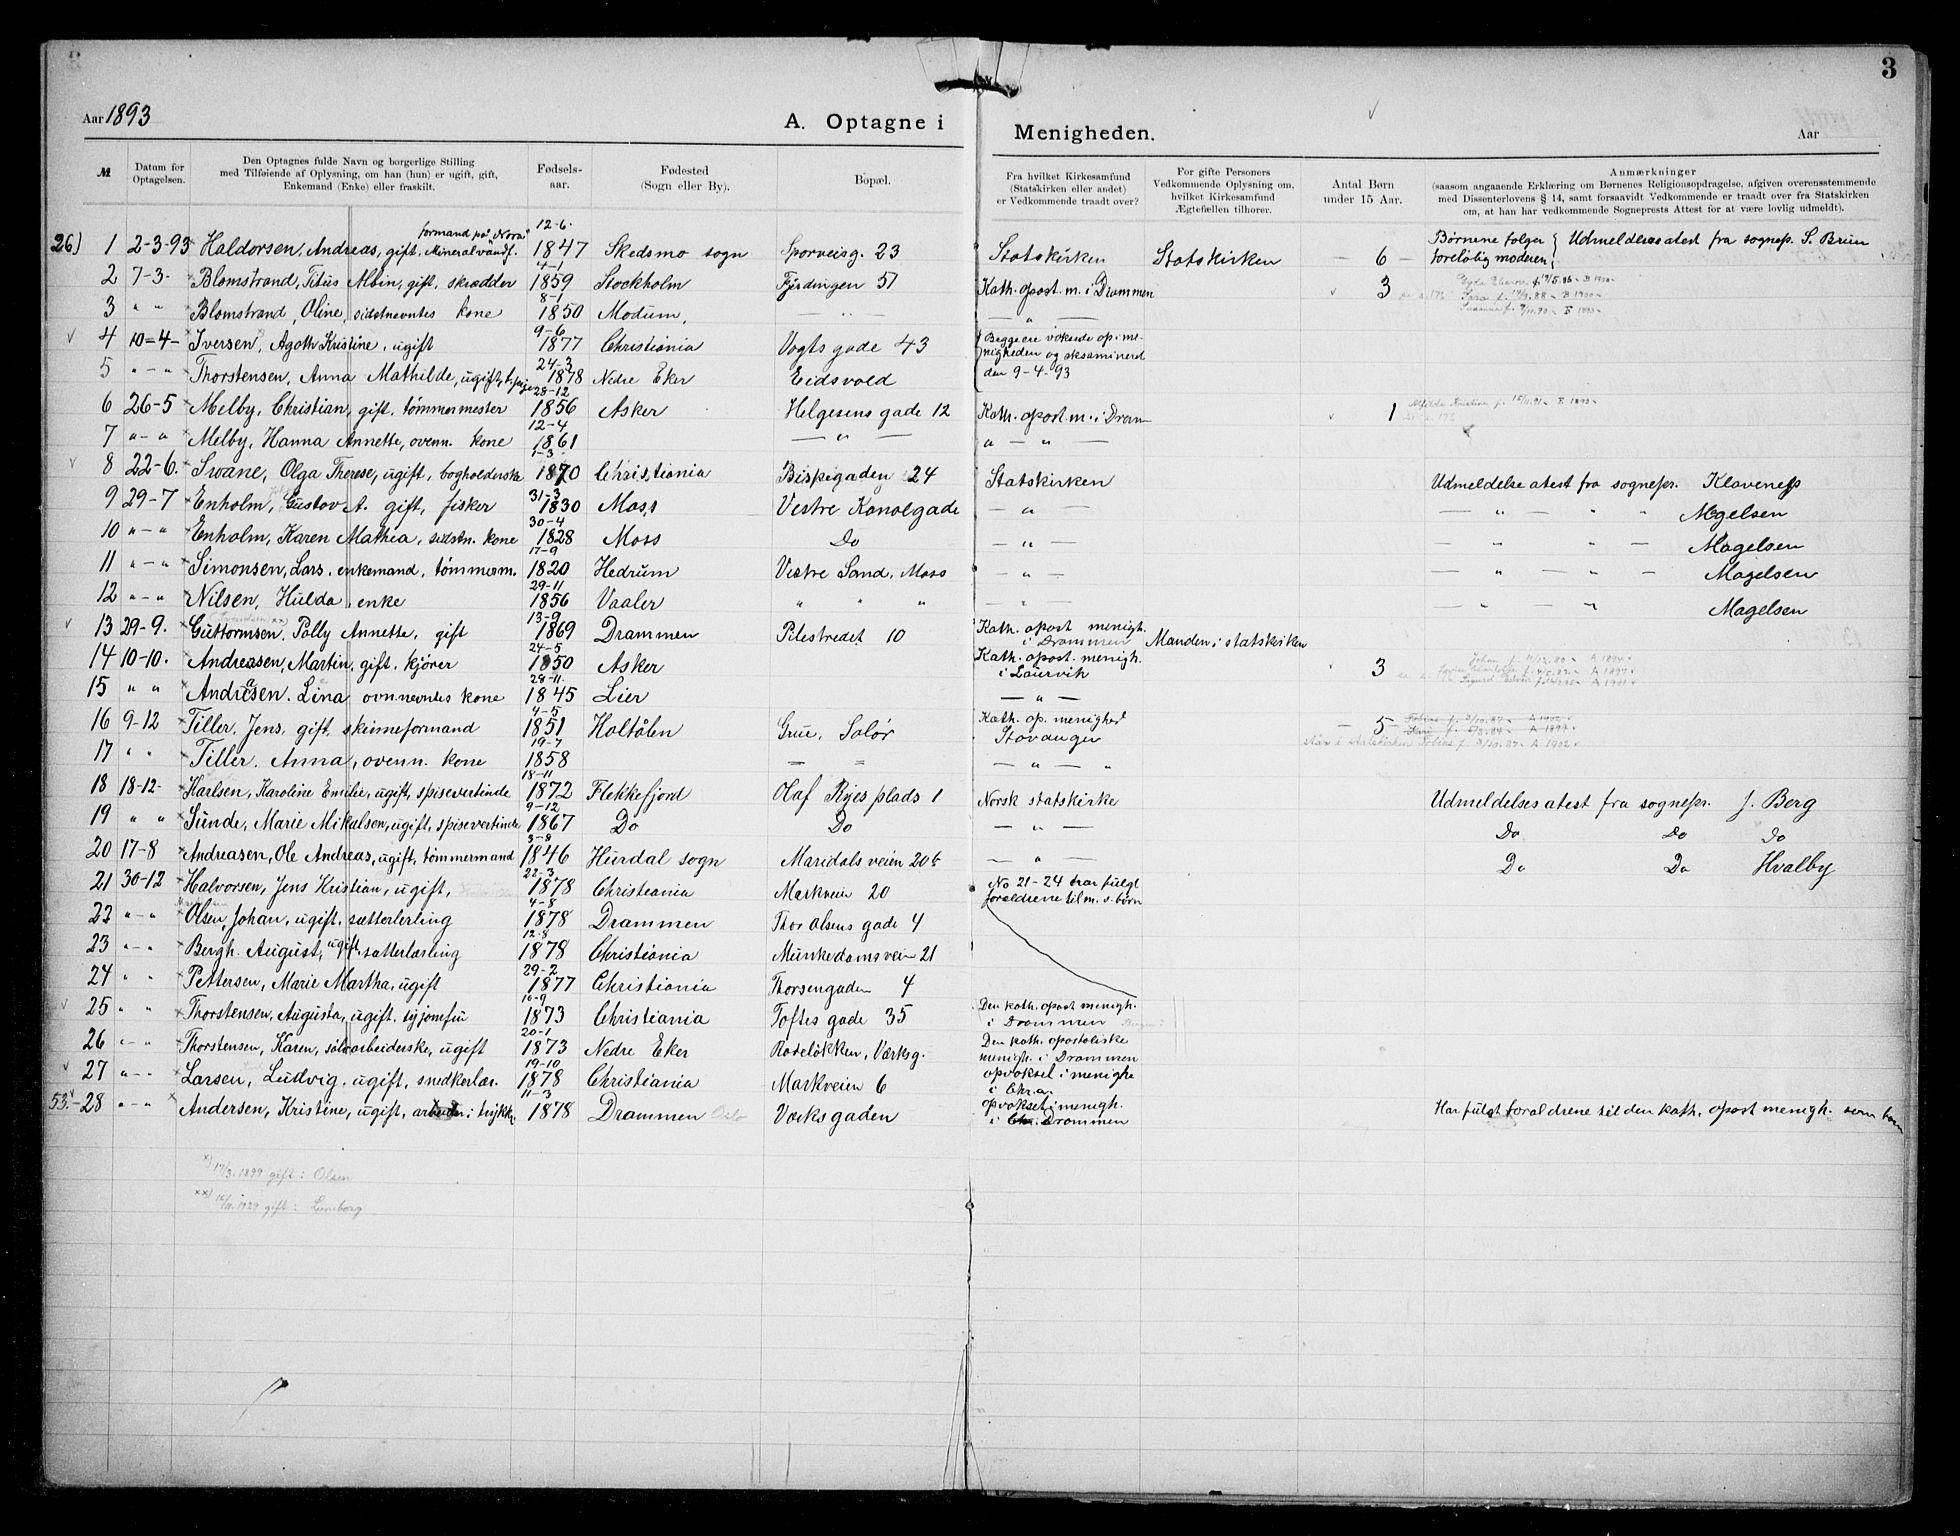 SAO, Den katolsk apostoliske menighet i Oslo , F/Fa/L0002: Dissenterprotokoll nr. 2, 1892-1937, s. 3